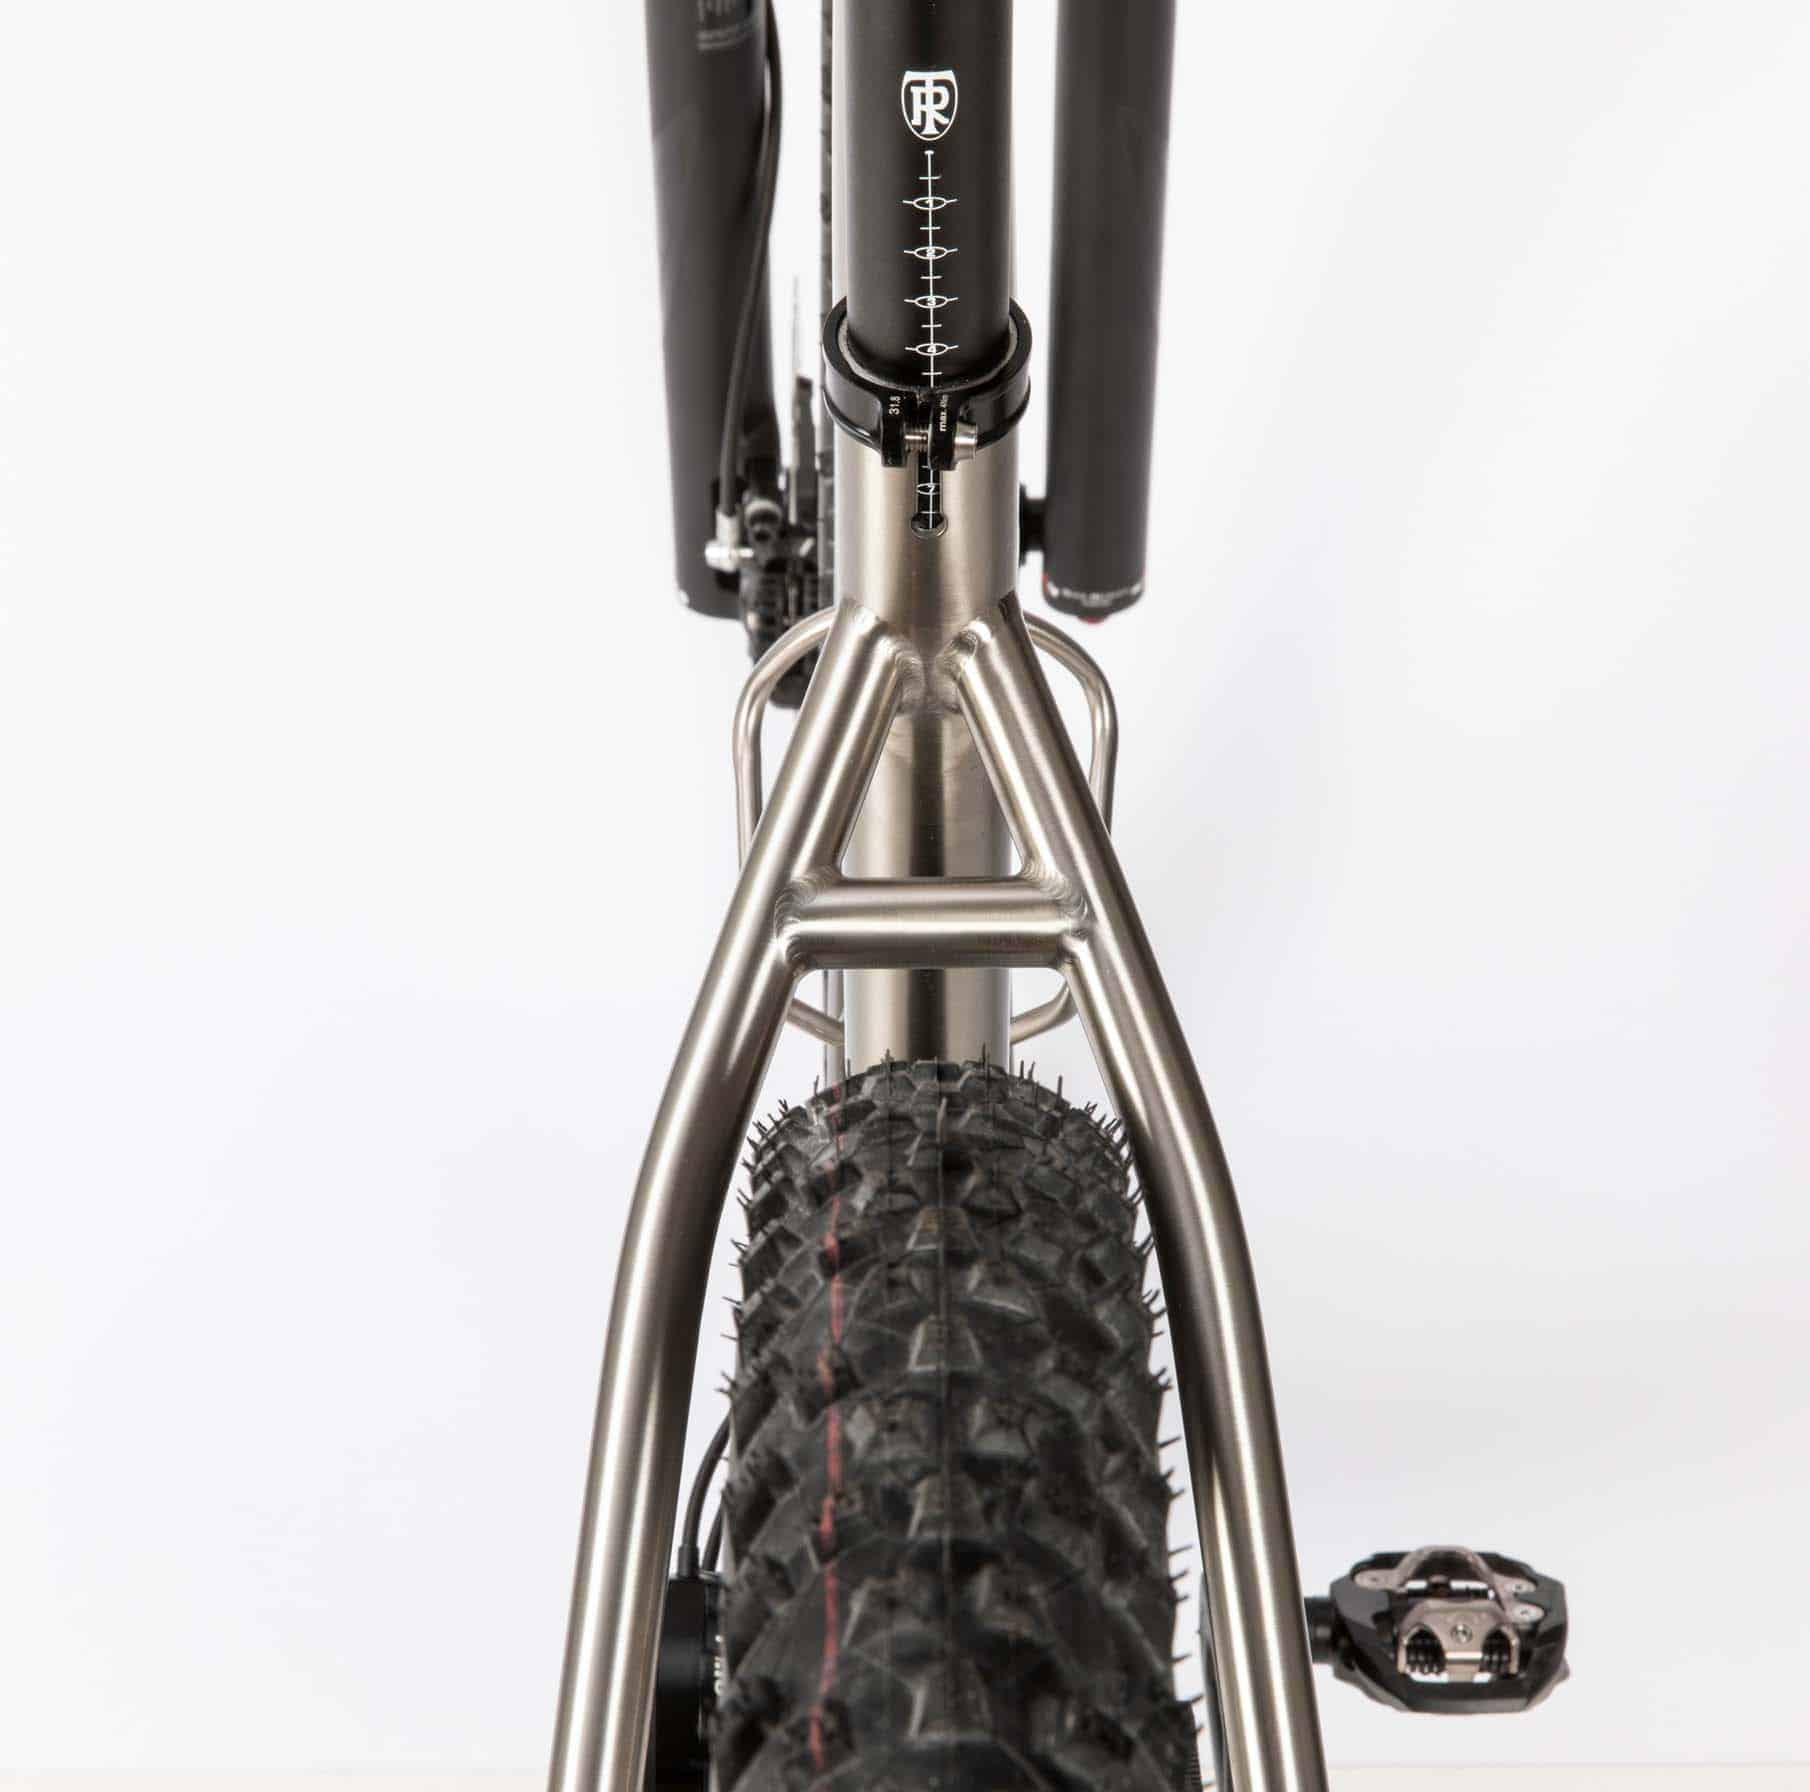 Pinion_Titan_MTB_Mountainbike_14